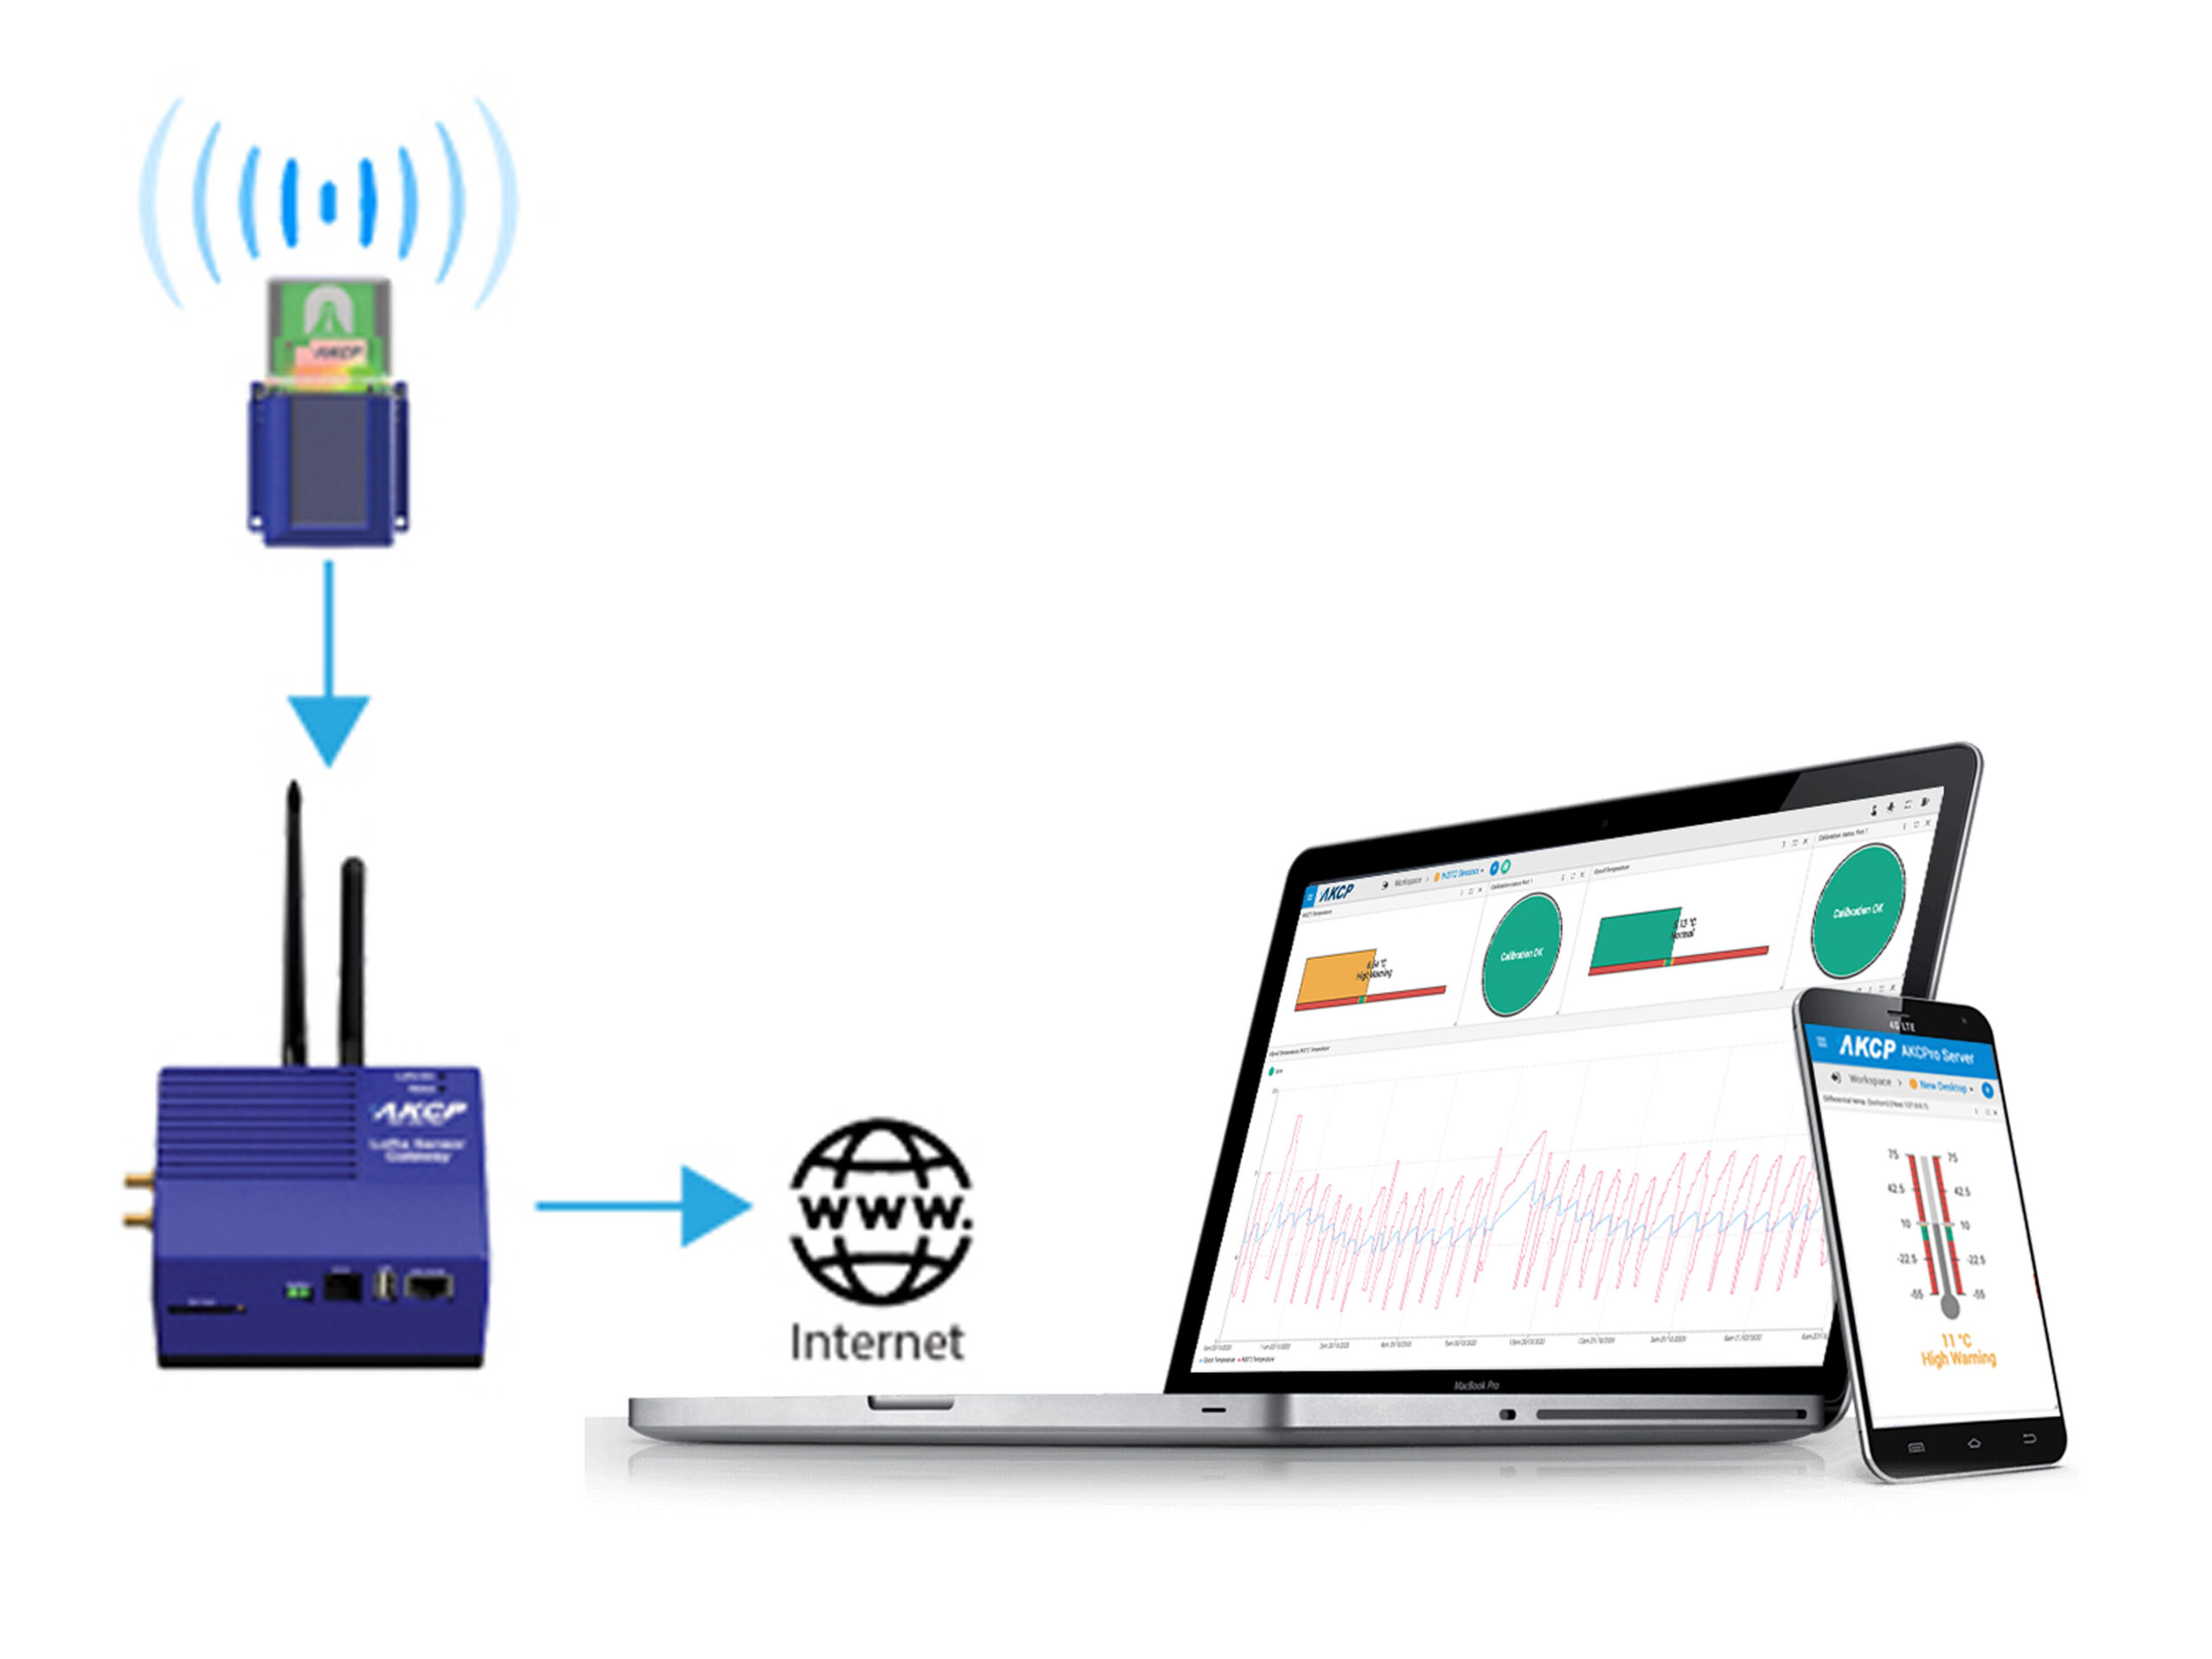 AKCP Wireless Tunnel Sensor monitoring